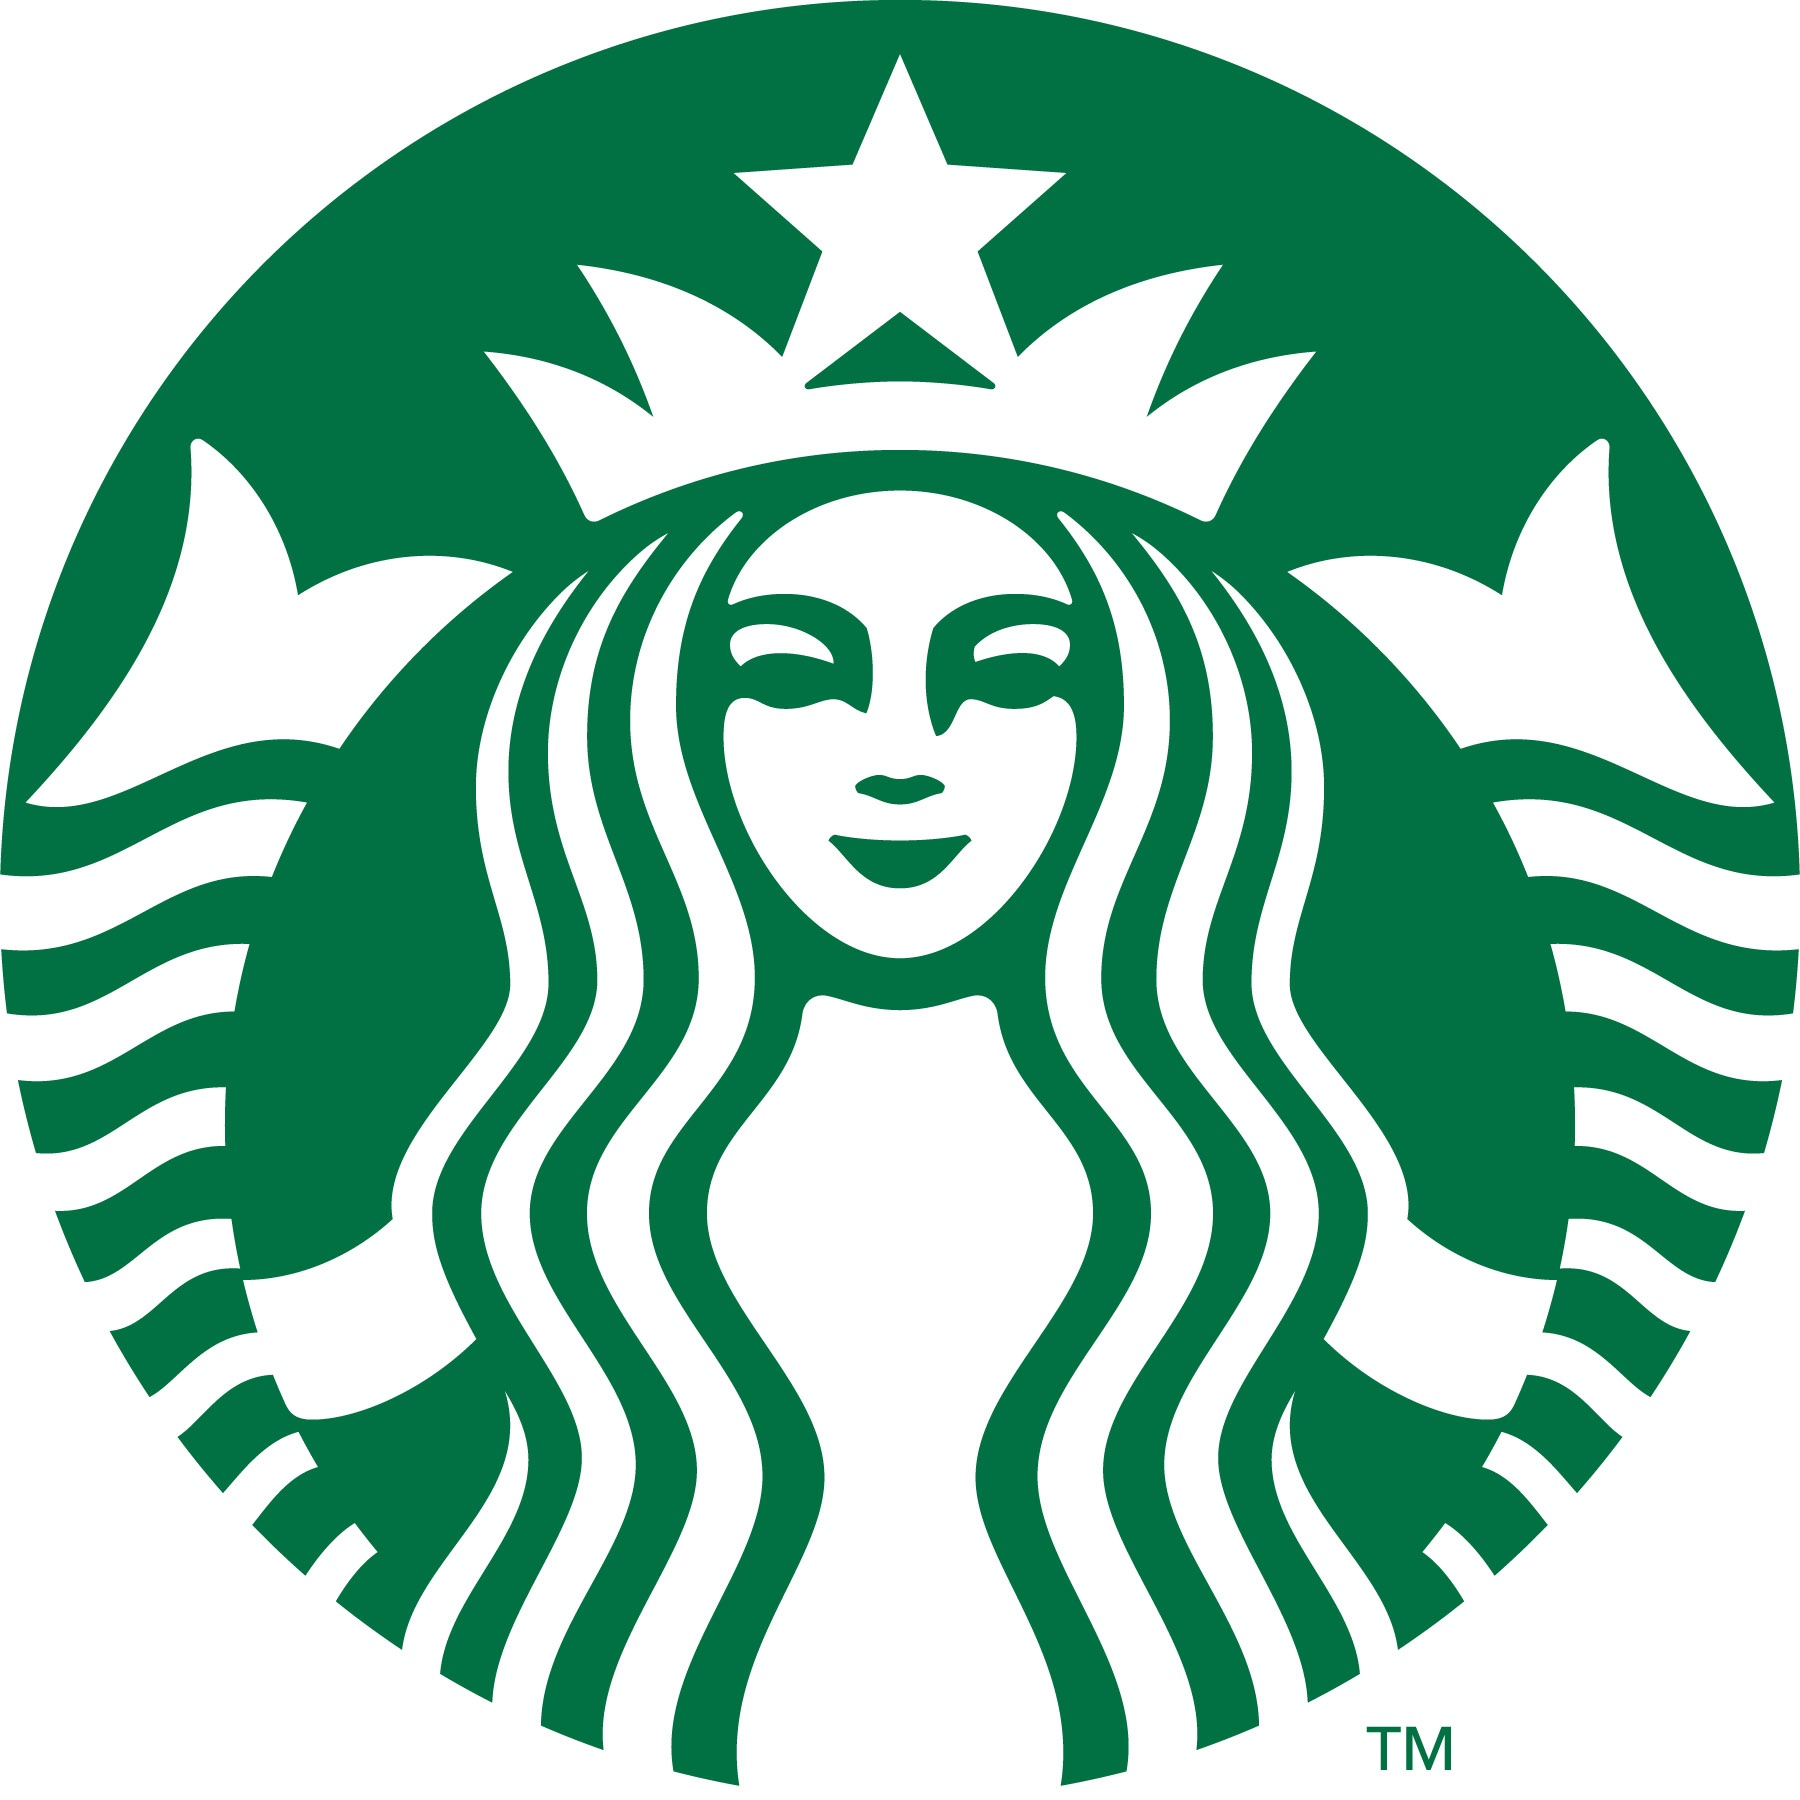 Starbucks Commits $100 Million as Cornerstone Investor in